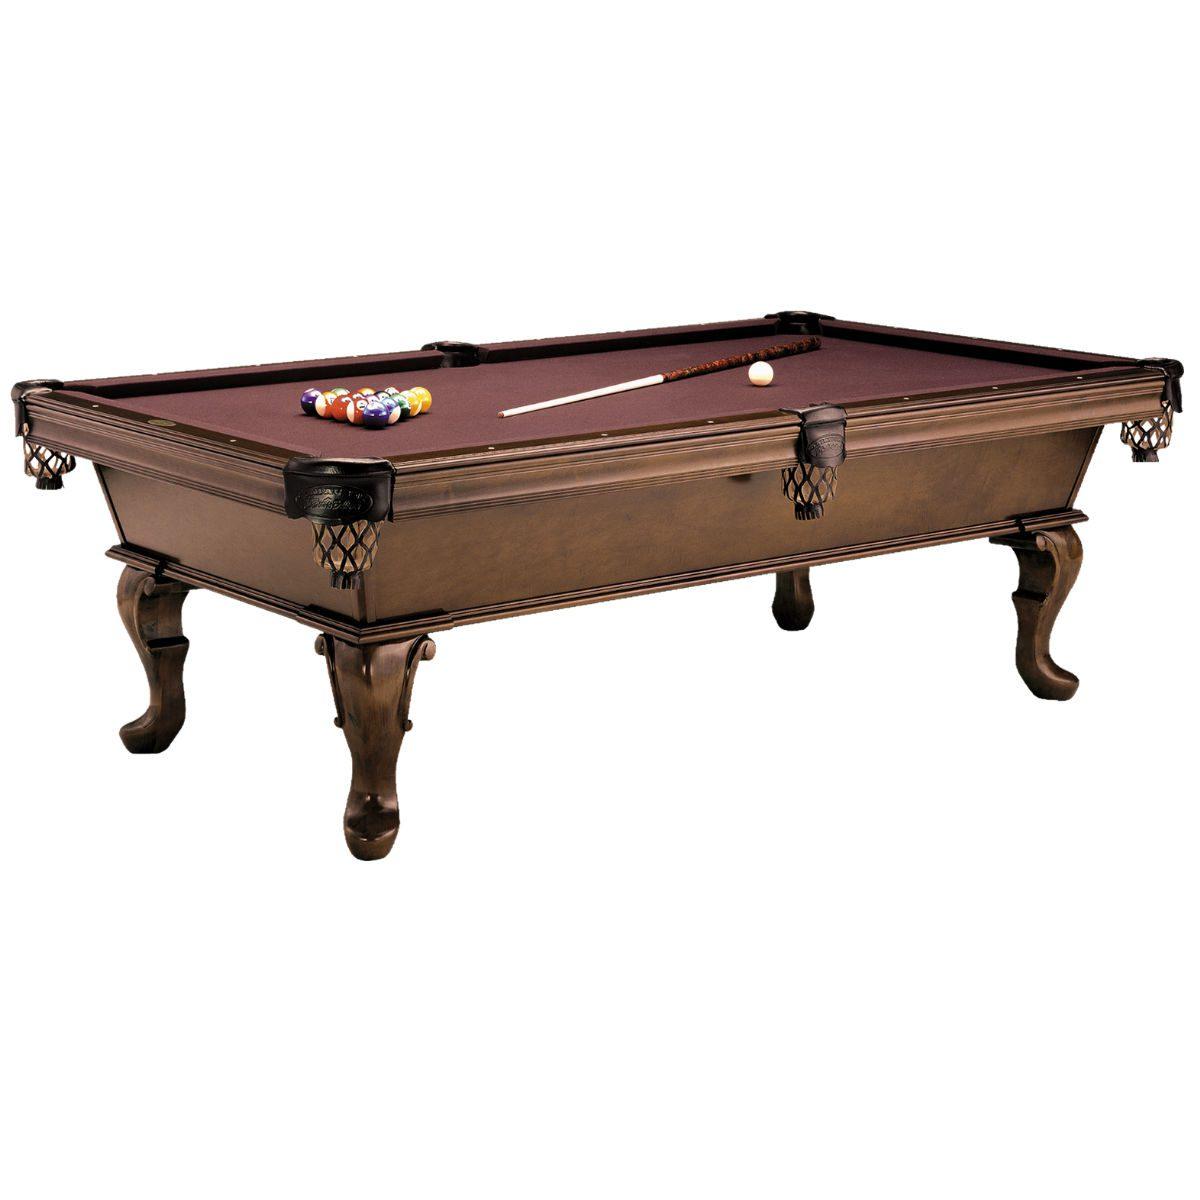 New Virginia Pool Table Olhausen Montgomeryville Pa